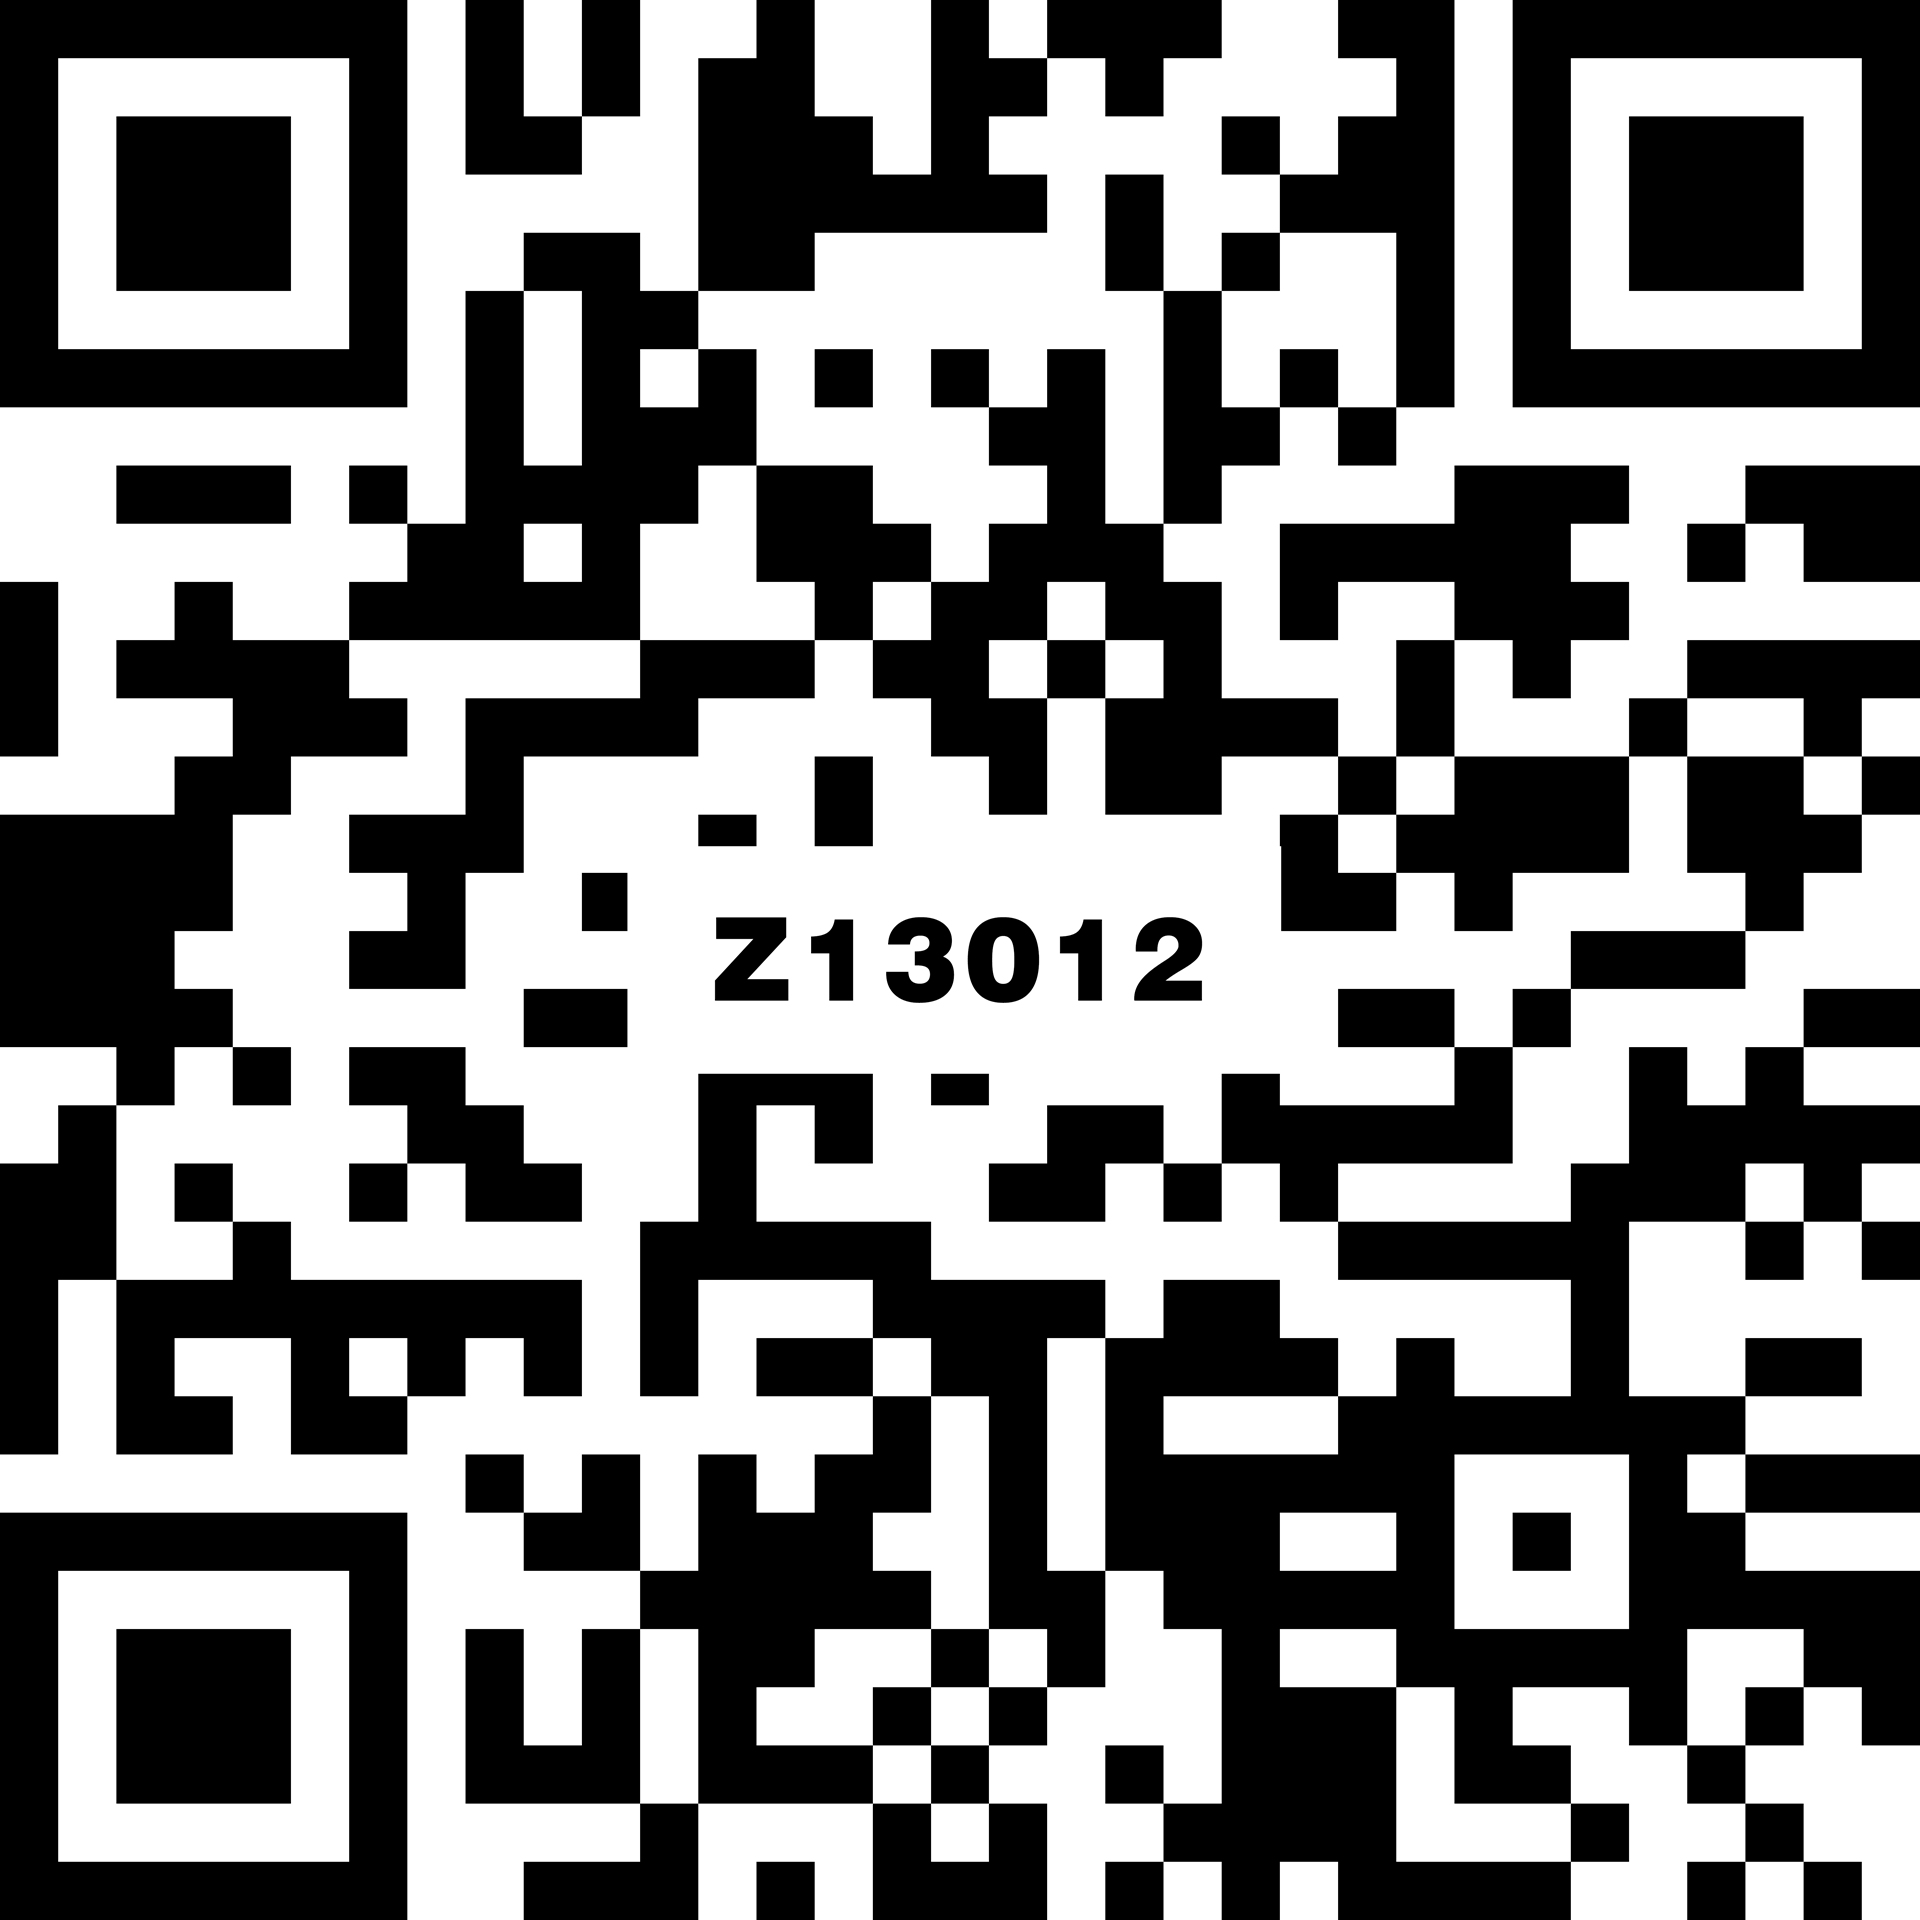 Z13012